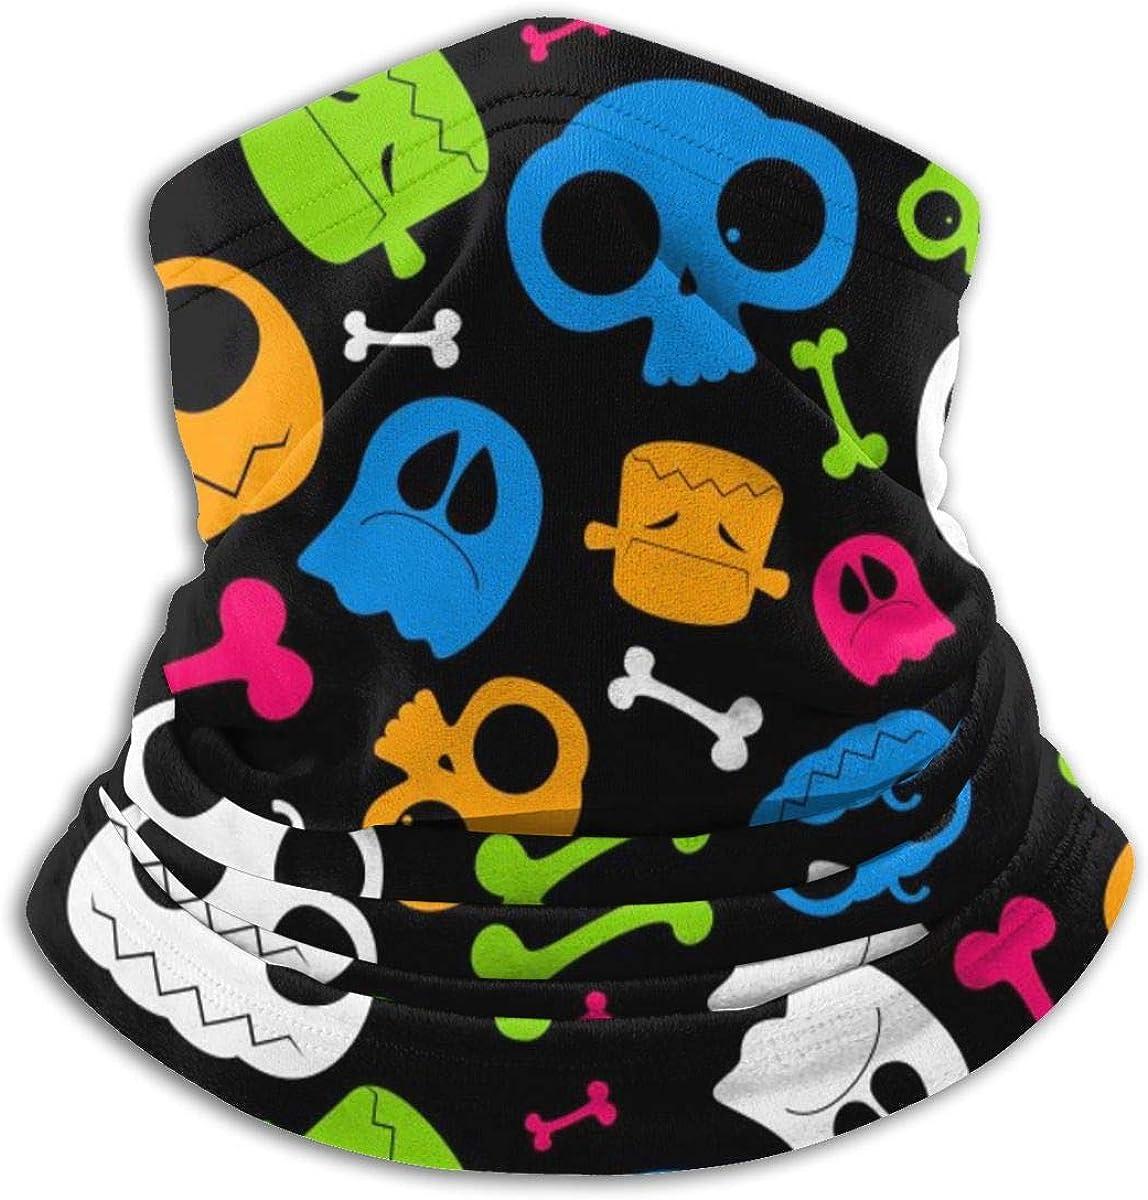 SITU Luxury Xmas Patchwork Pattern Headwear Neck Gaiter Scarf Face Cover